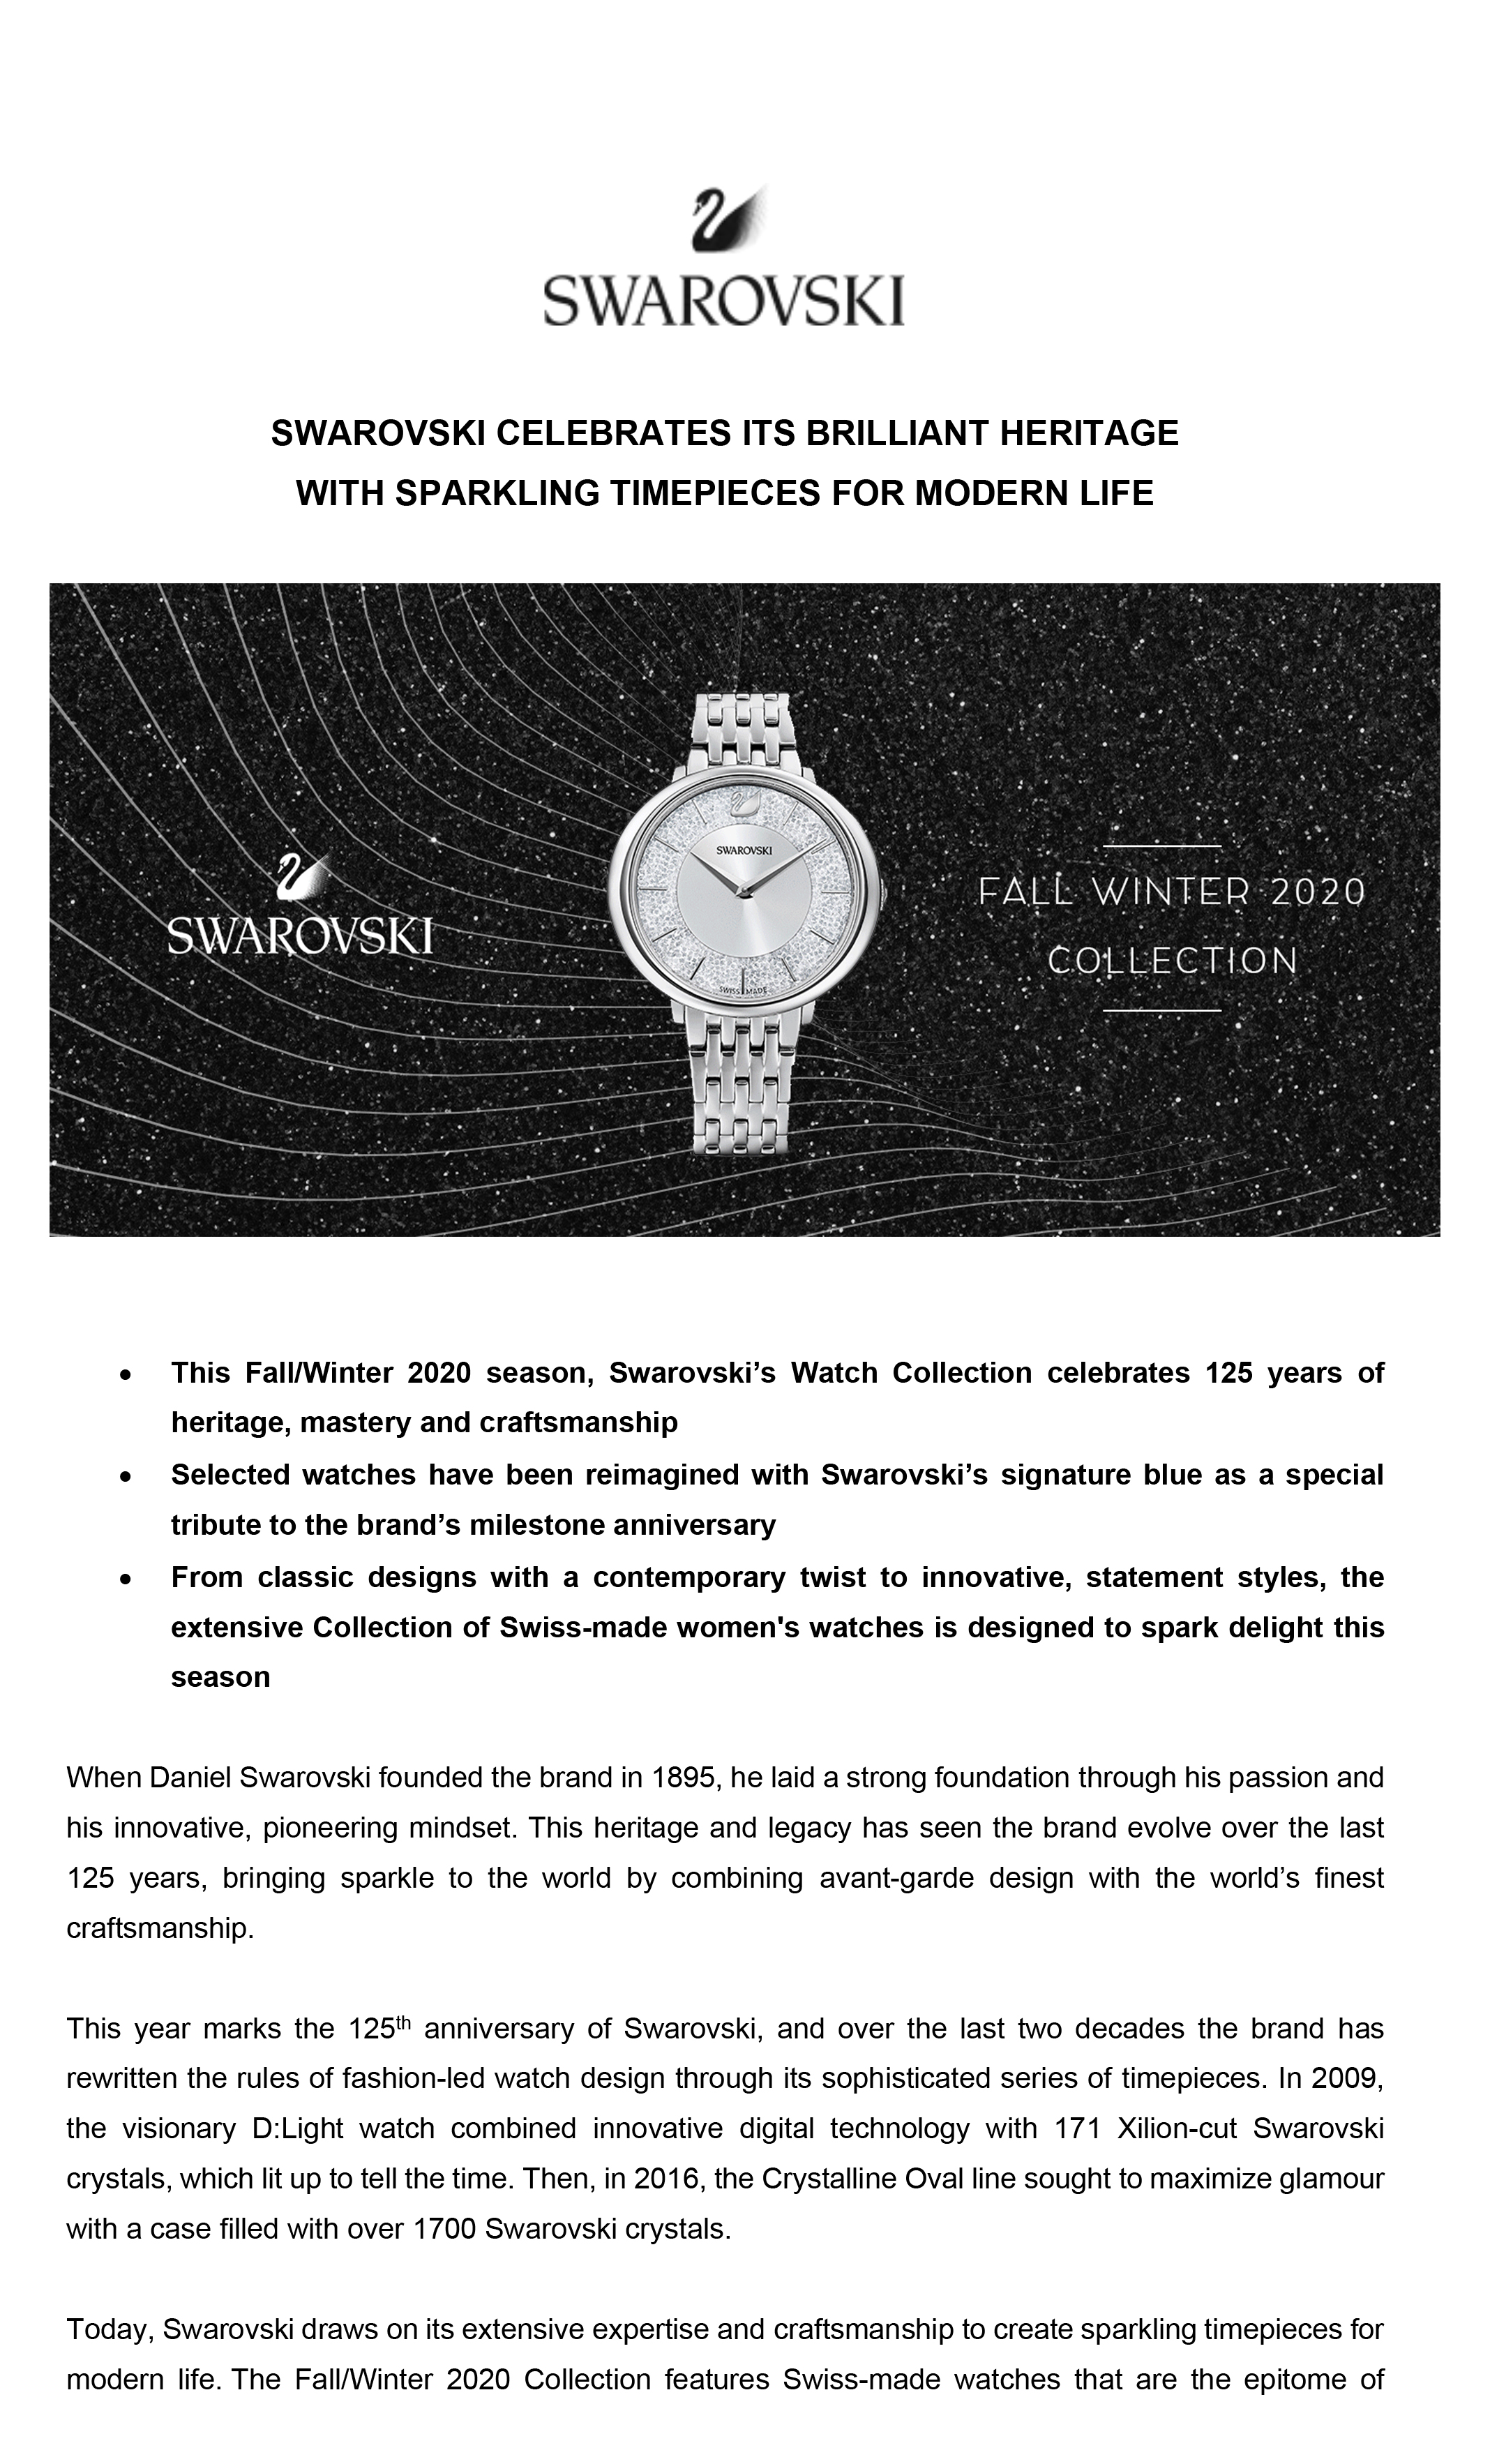 pubertad télex becerro  SWAROVSKI CELEBRATES ITS BRILLIANT HERITAGE WITH SPARKLING TIMEPIECES FOR  MODERN LIFE | Peepul PR